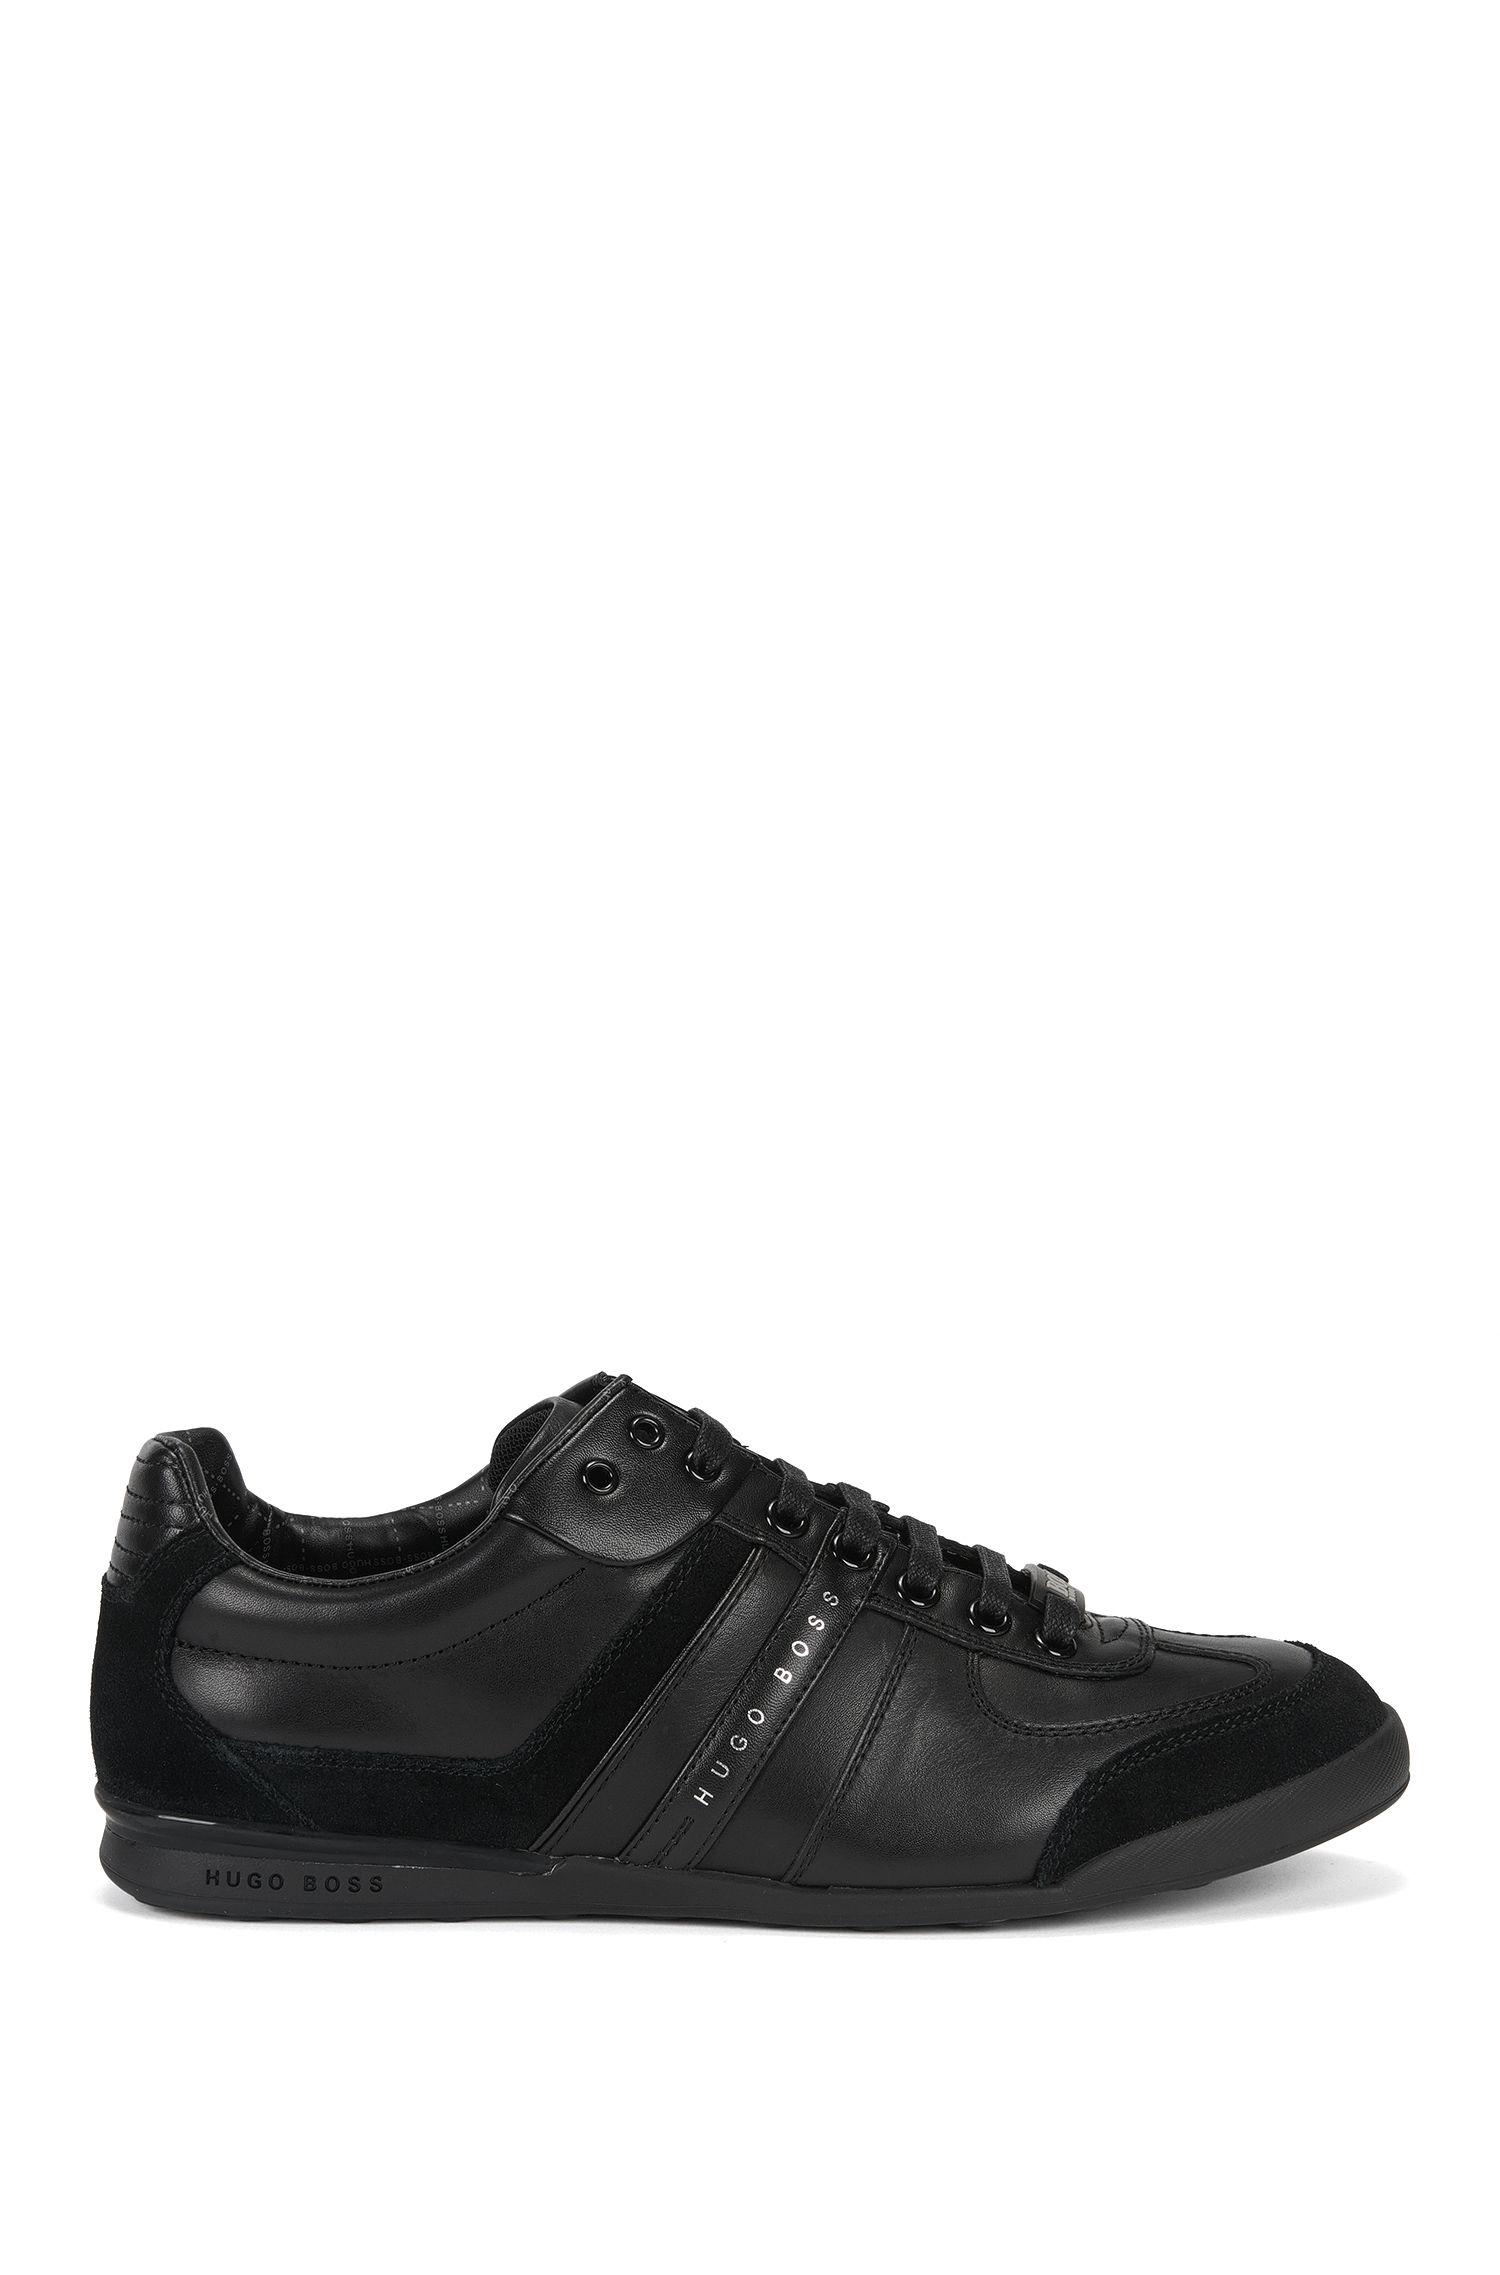 Low-top Sneakers aus Glatt- und Veloursleder